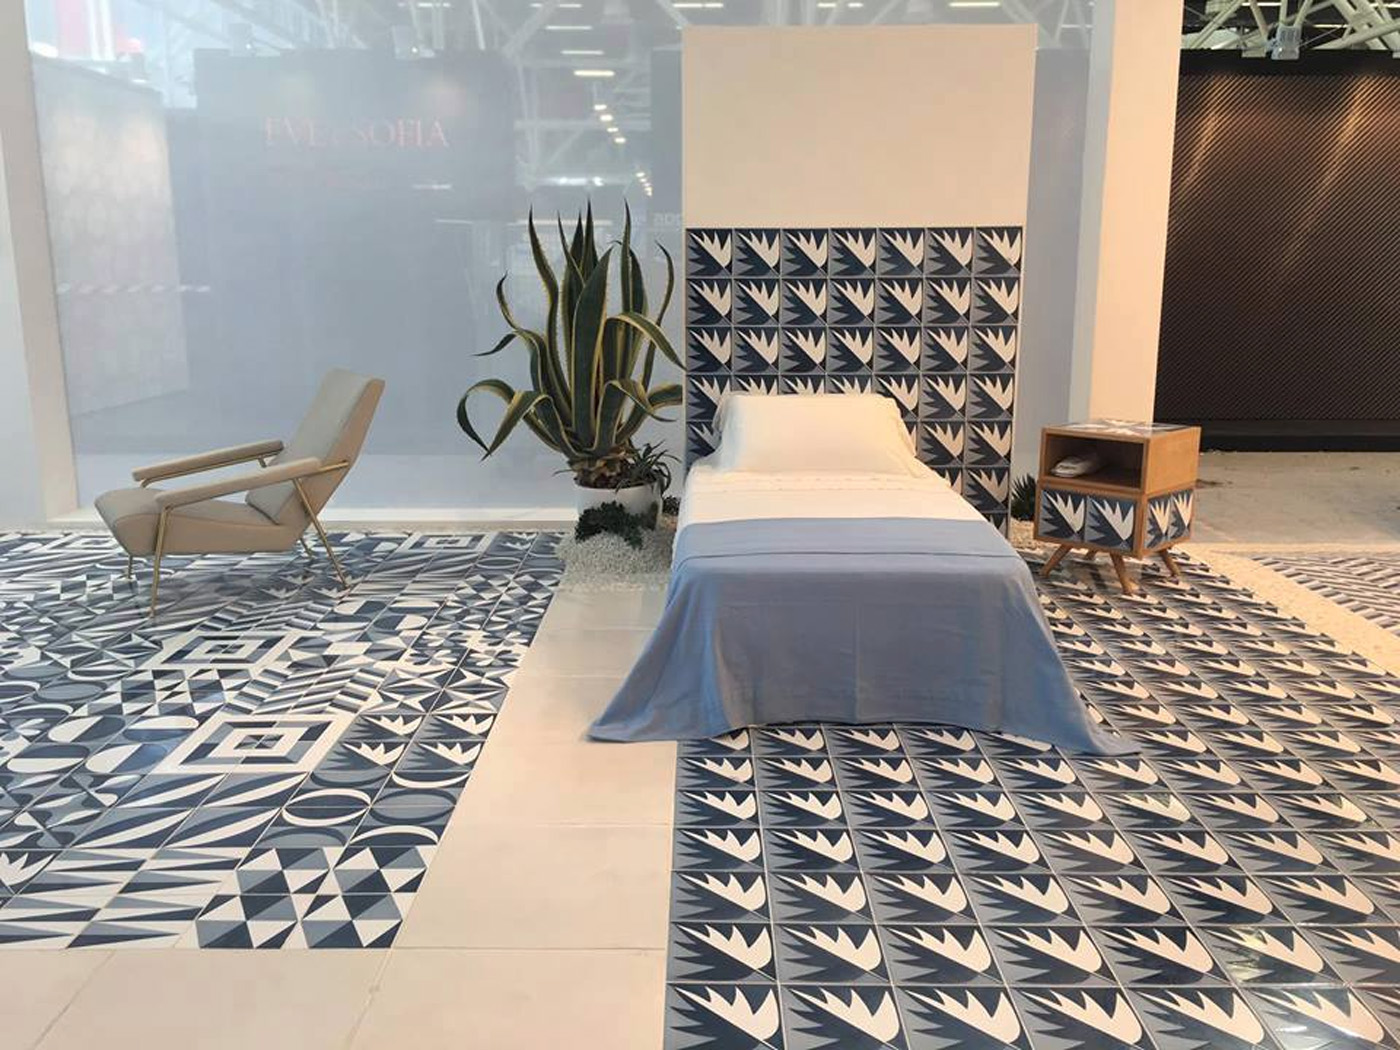 Crea idea casa gio ponti ceramica francesco de maio u cl infinito bluu d